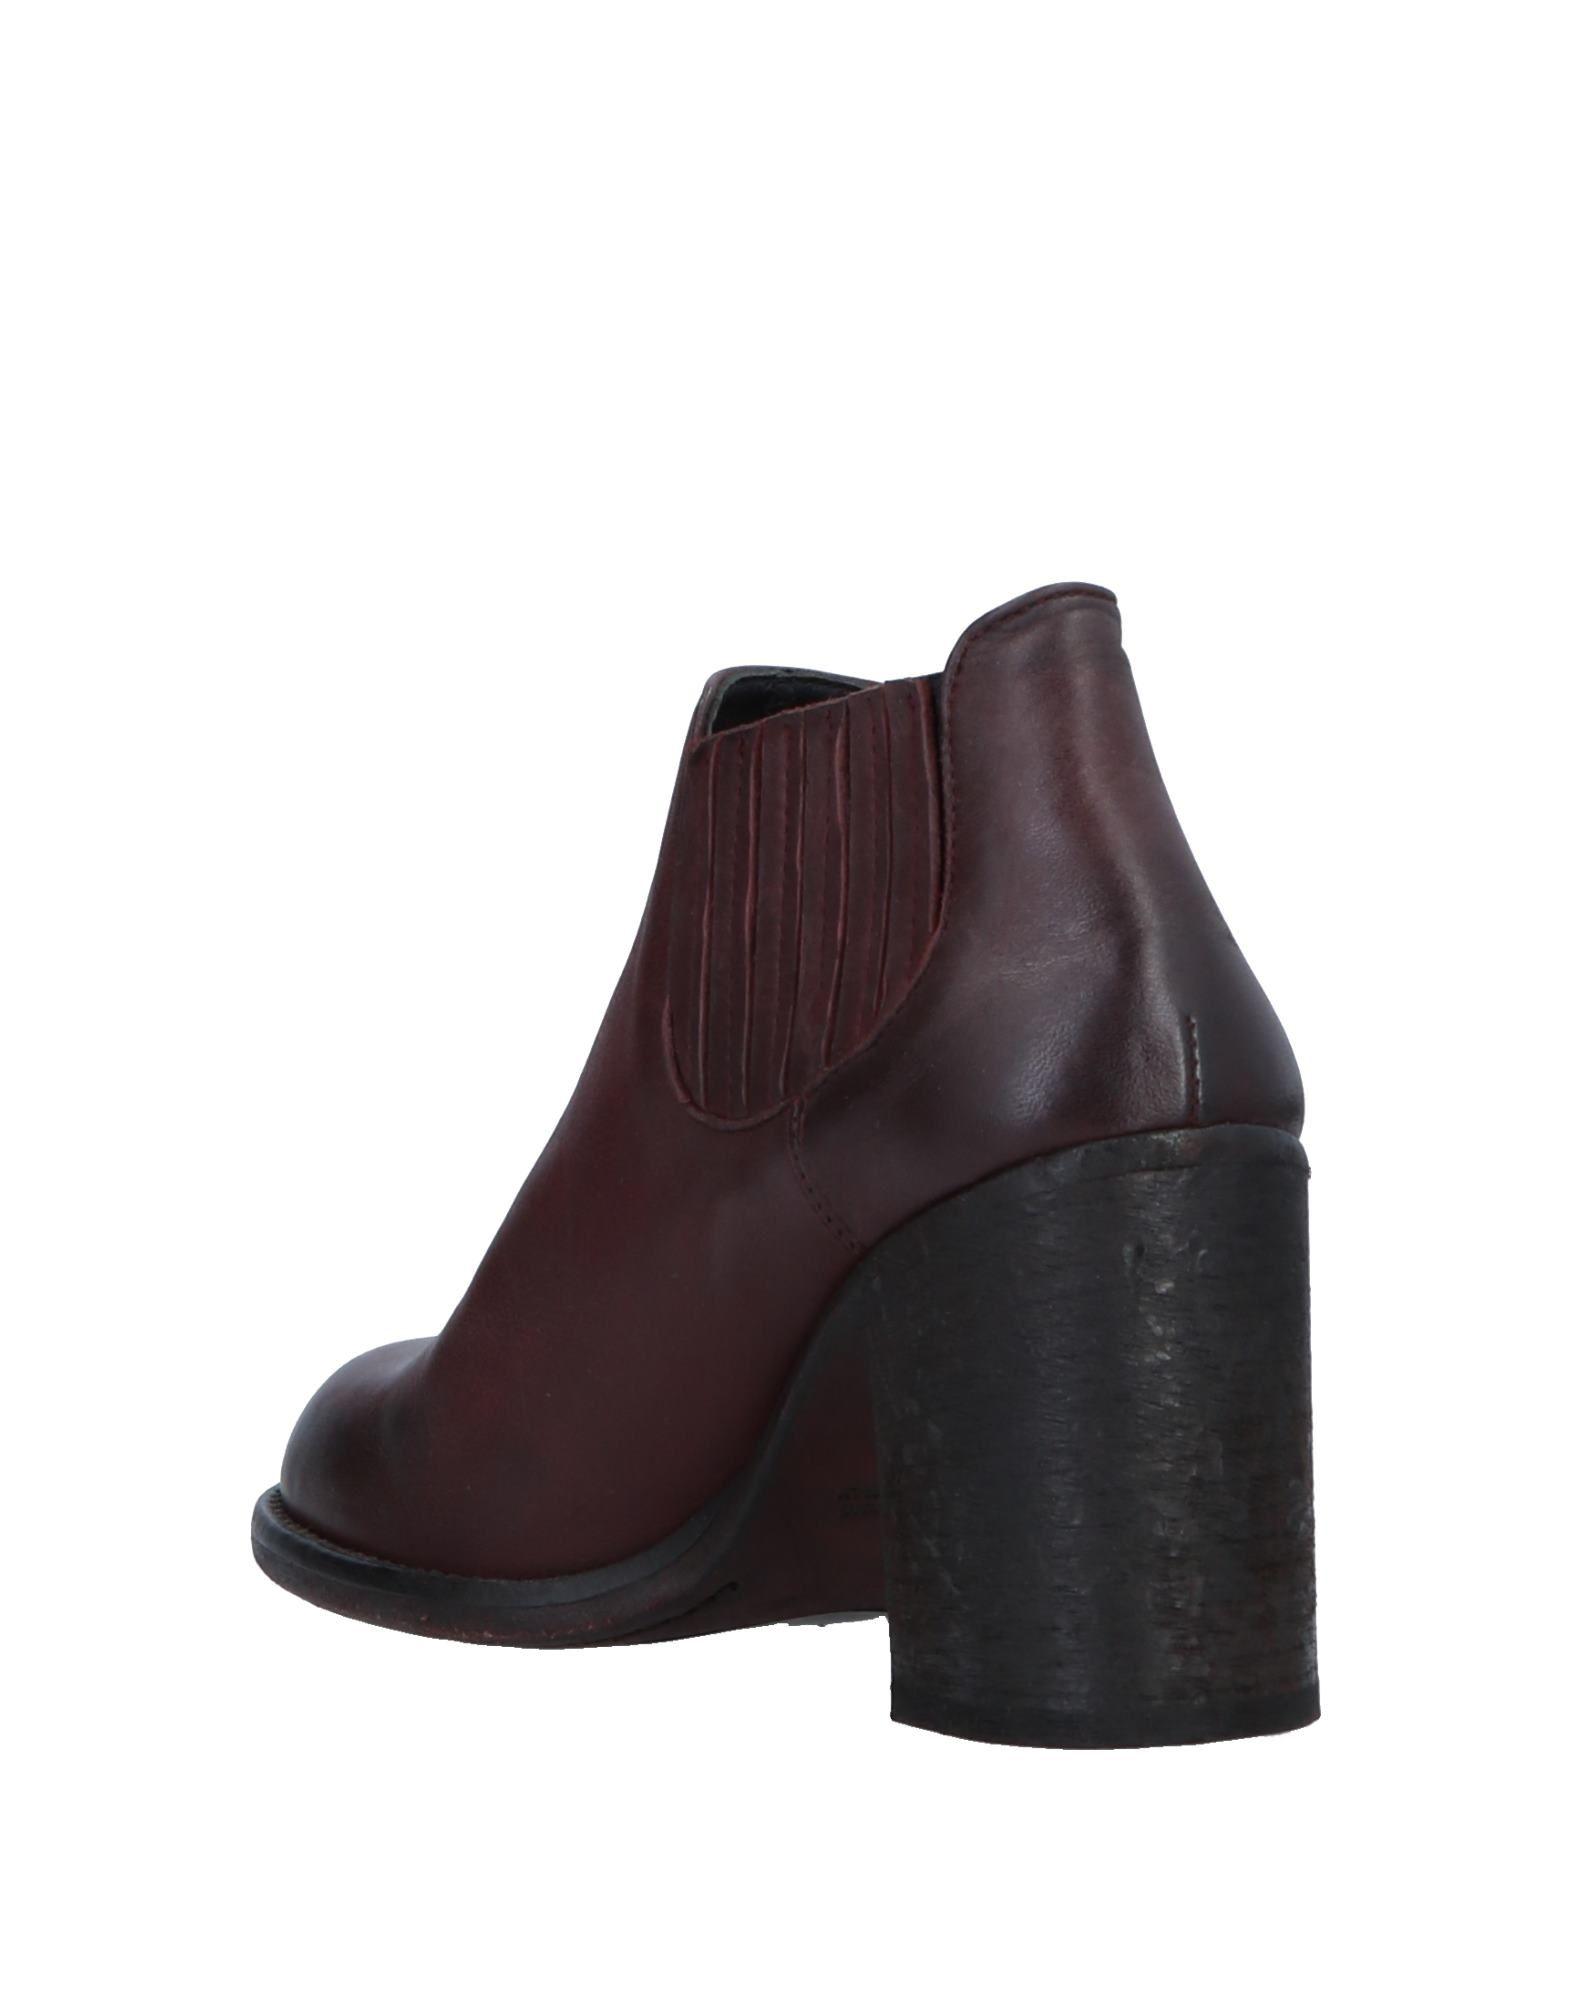 Strategia Chelsea Boots strapazierfähige Damen  11536335WXGut aussehende strapazierfähige Boots Schuhe 6de3fc